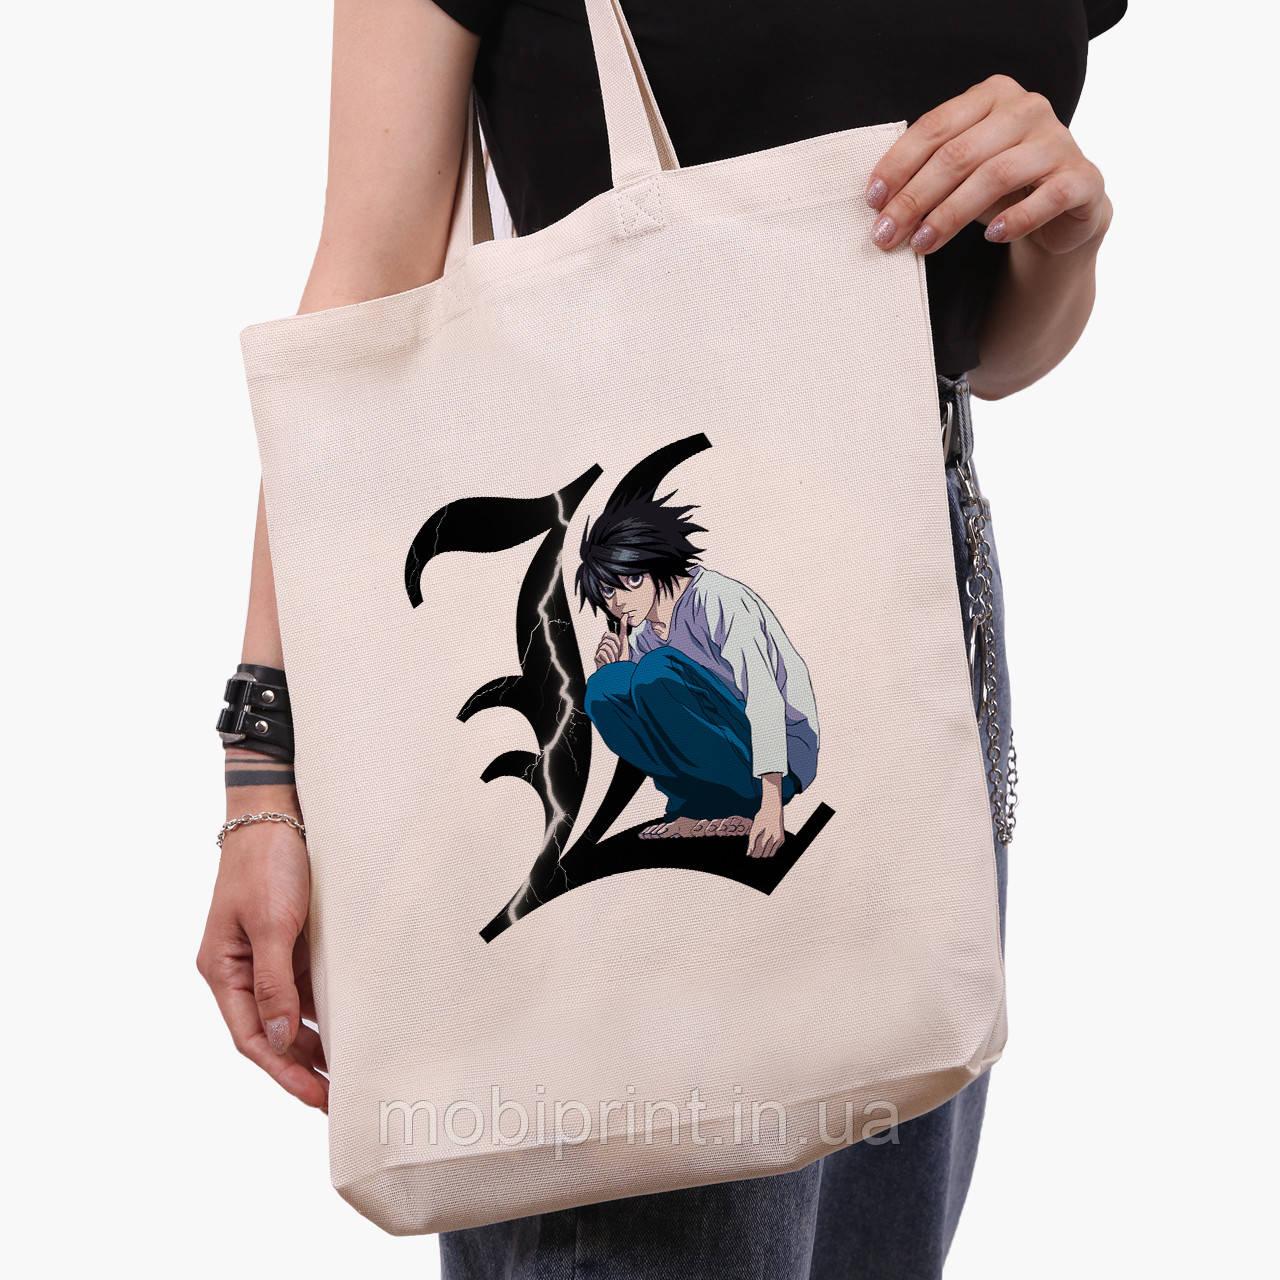 Эко сумка шоппер белая Эл Лоулайт Тетрадь смерти (L Death Note) (9227-2826-1)  41*39*8 см